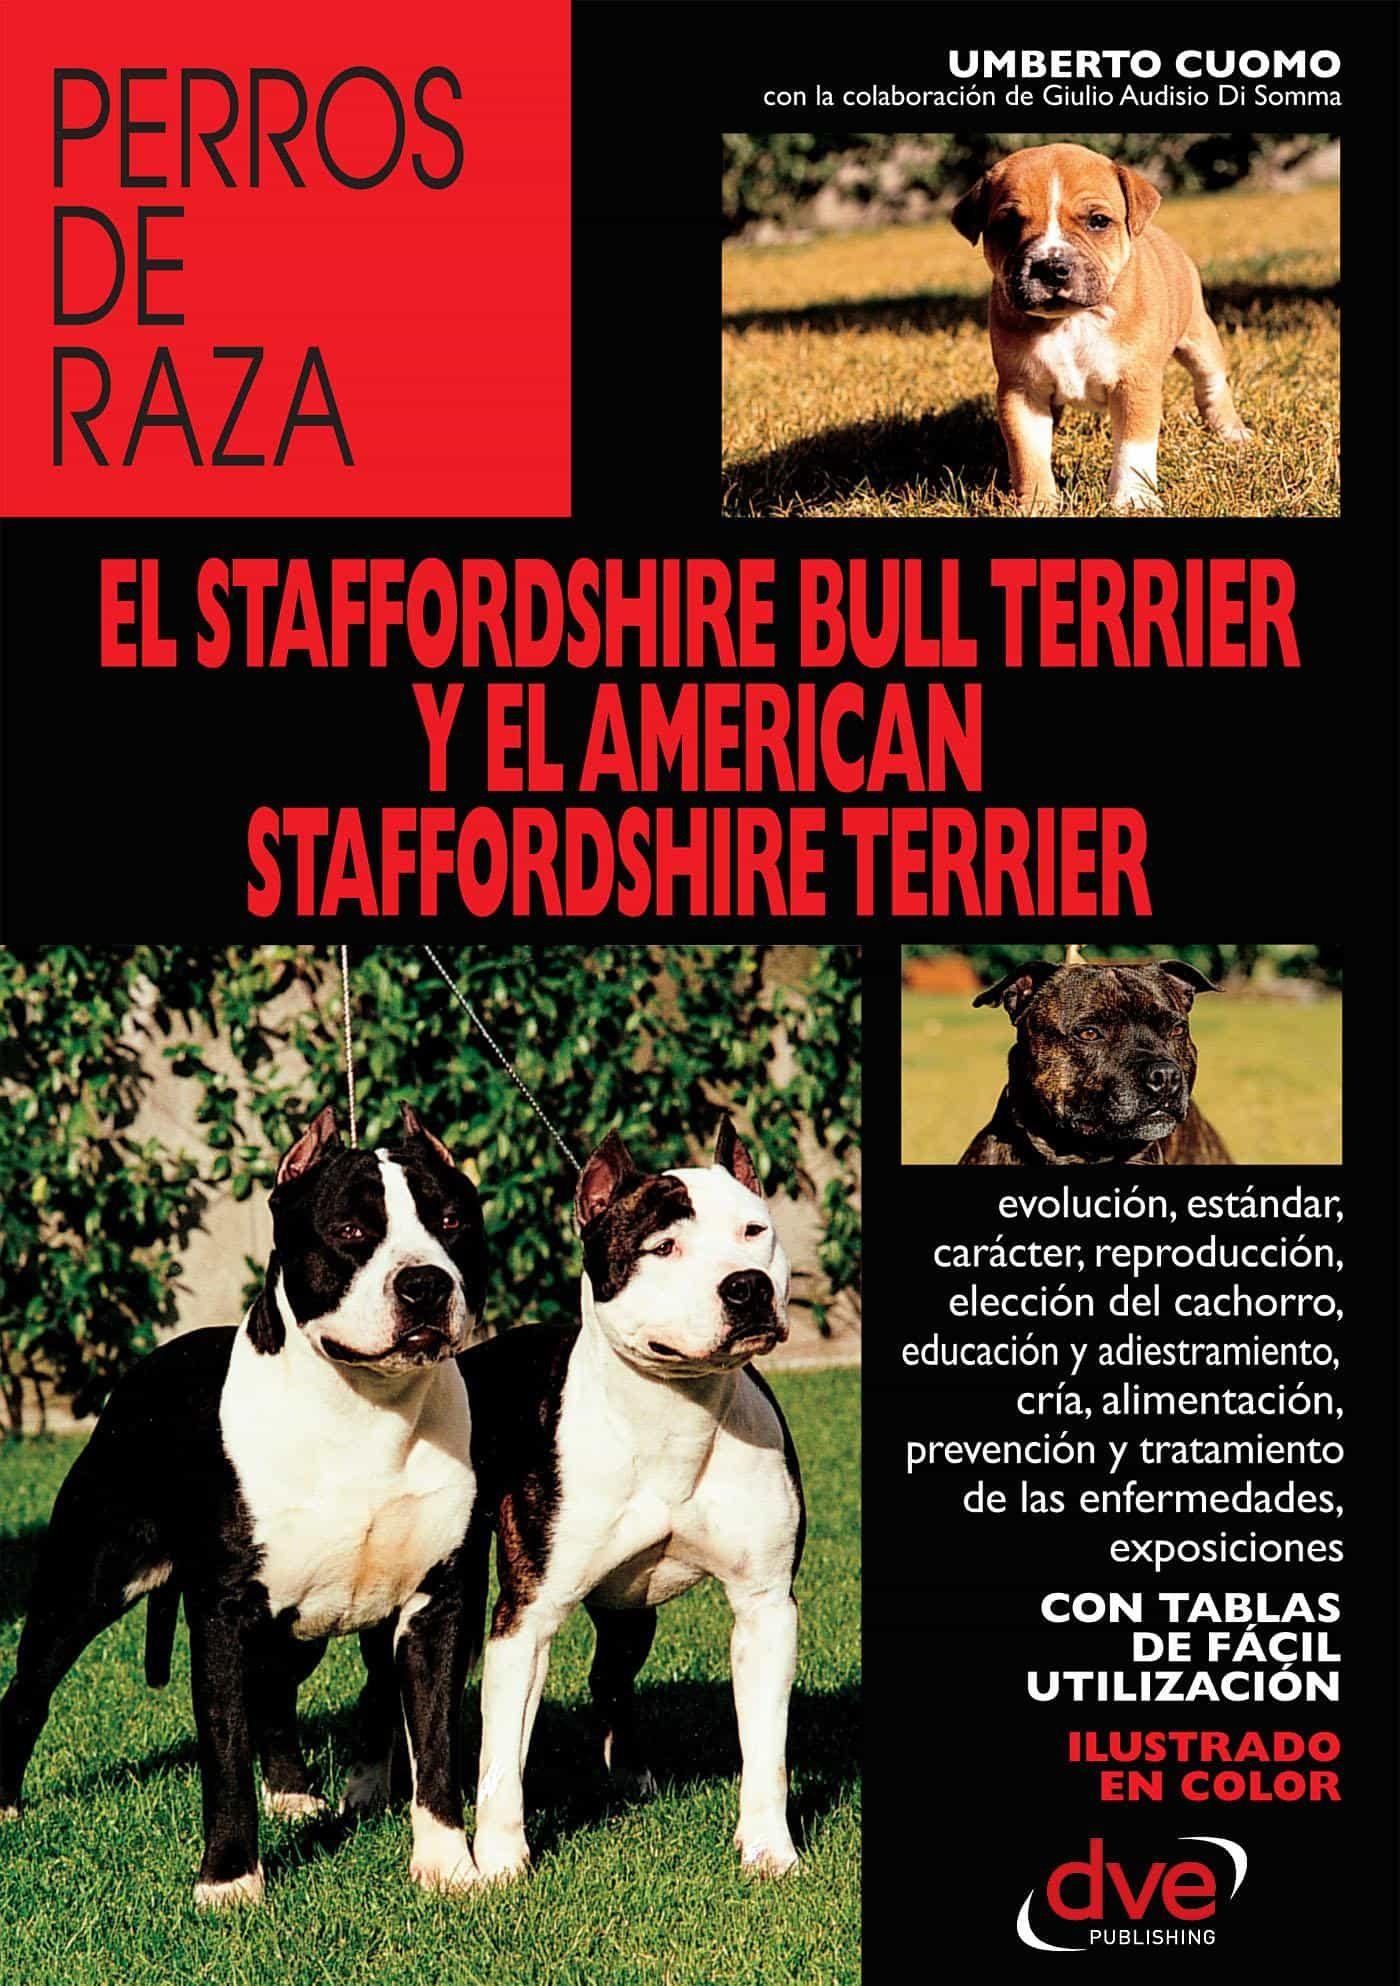 EL STAFFORDSHIRE BULL TERRIER Y EL AMERICAN STAFFORDSHIRE TERRIER ...